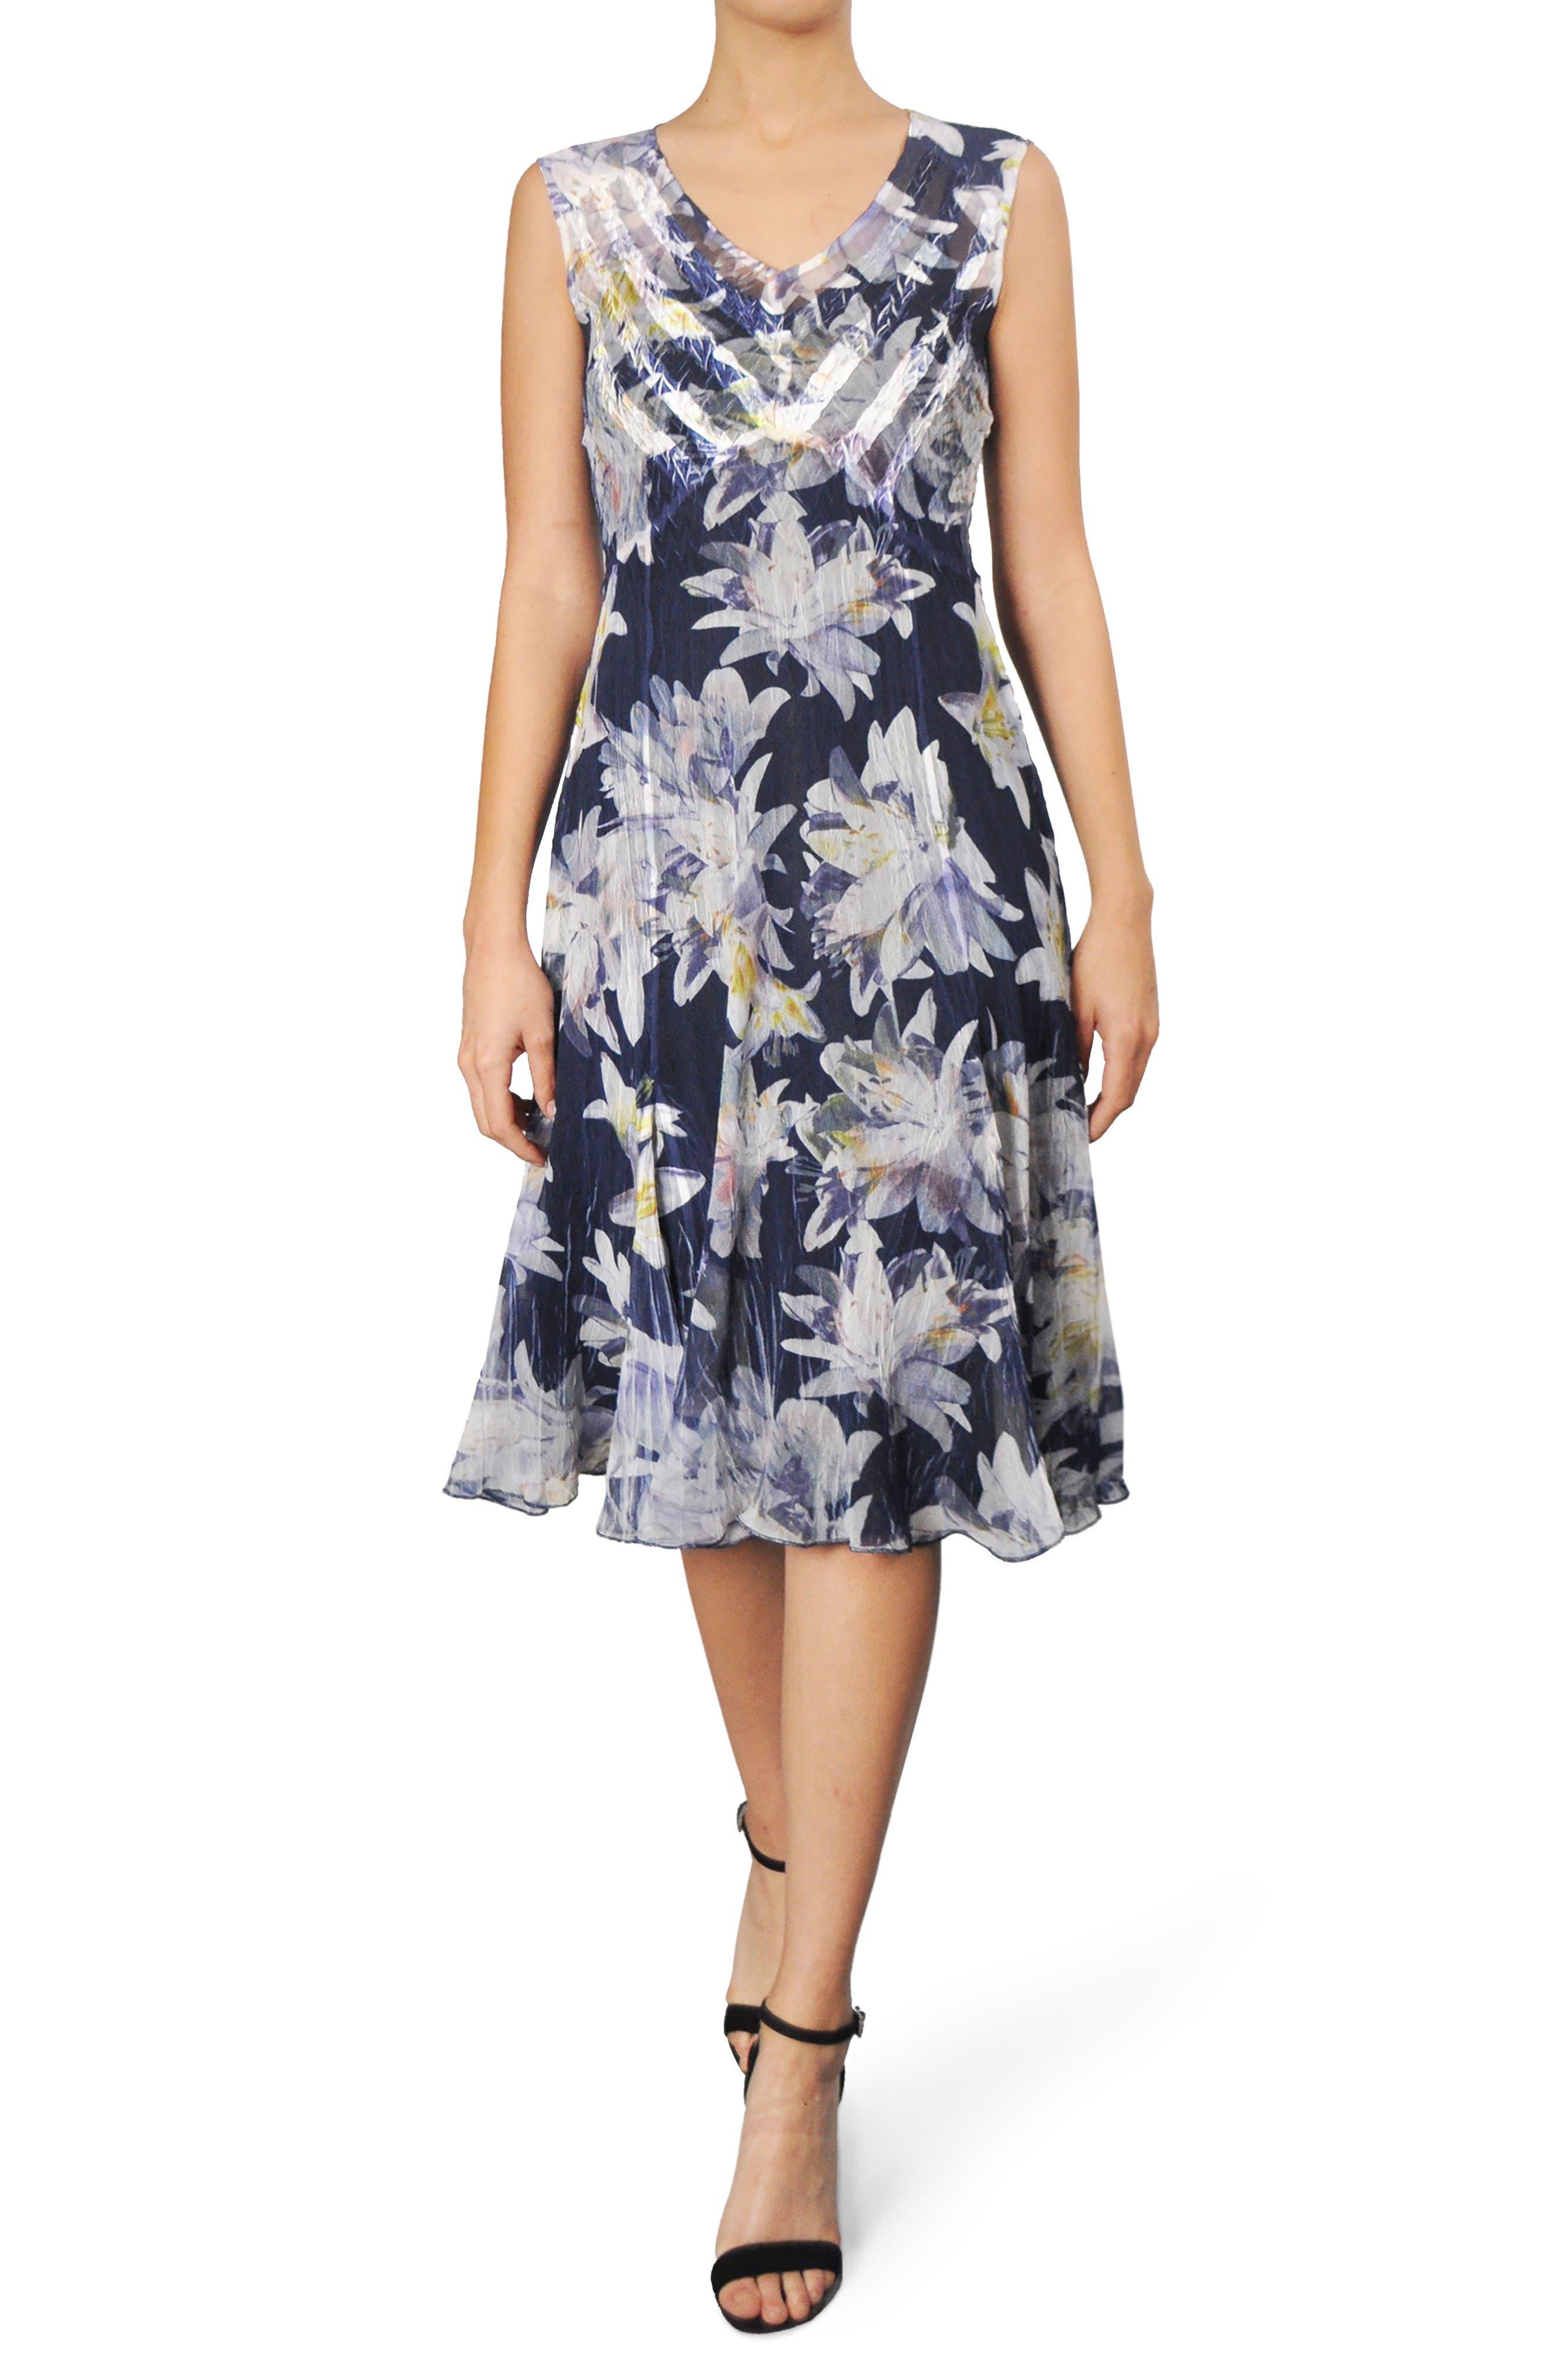 Alternate Image 1 Selected - Komarov Floral Chiffon A-Line Dress (Regular & Petite)